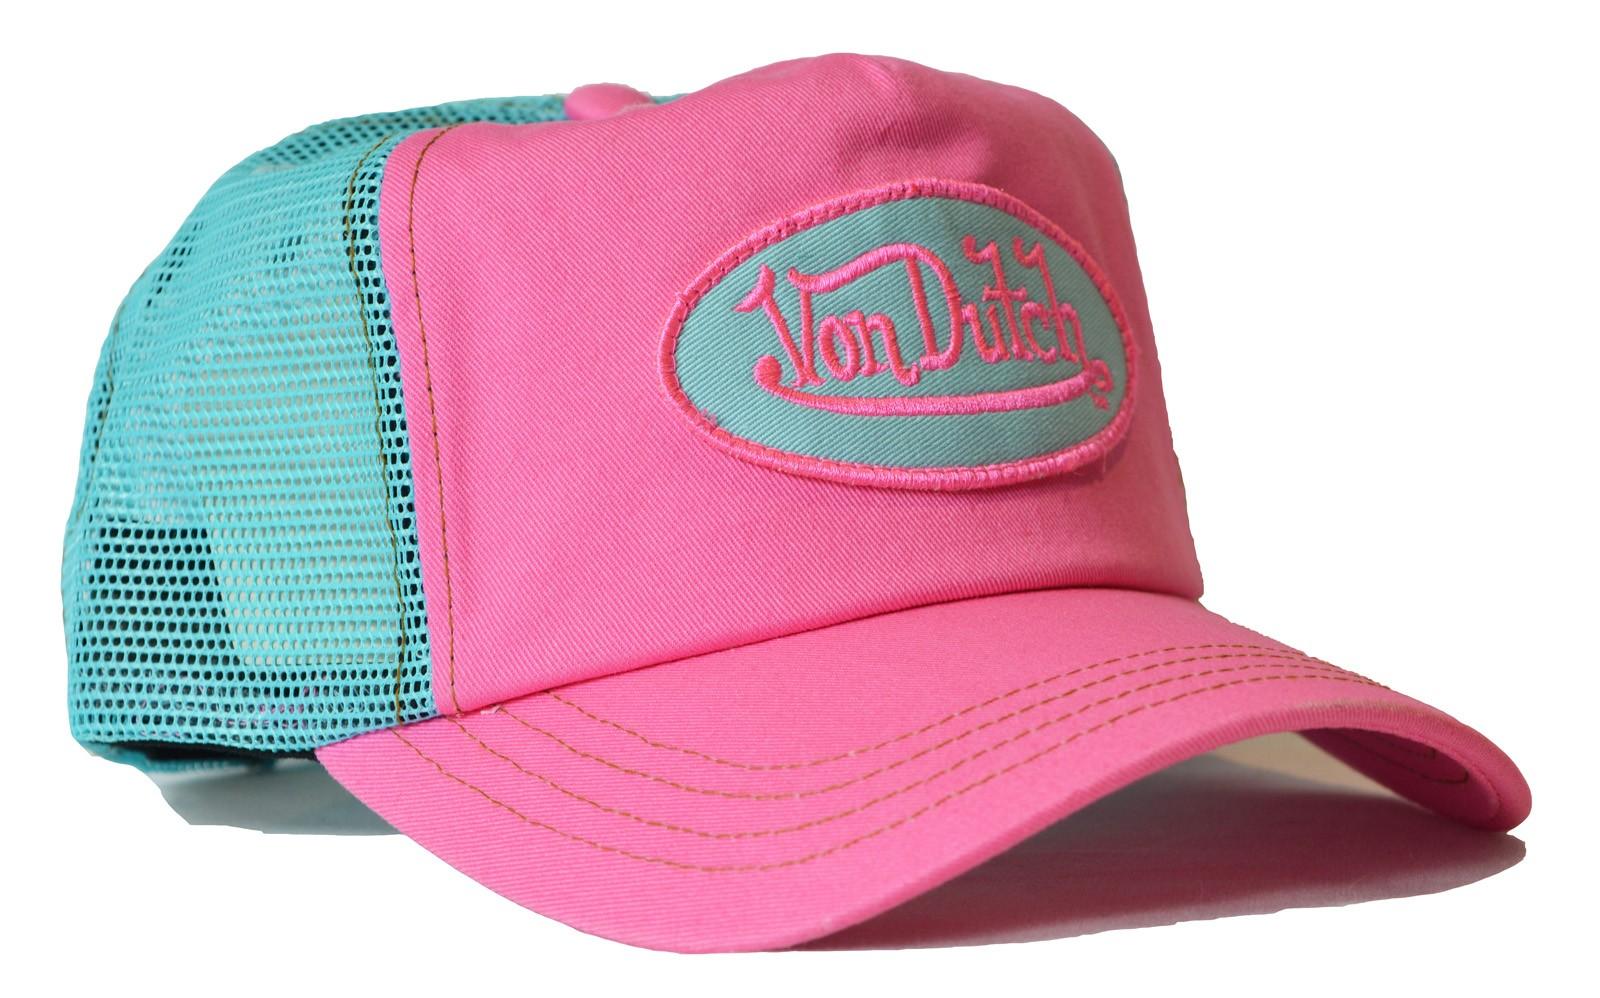 Von Dutch - Classic Pink/Aqua Mesh Trucker Cap